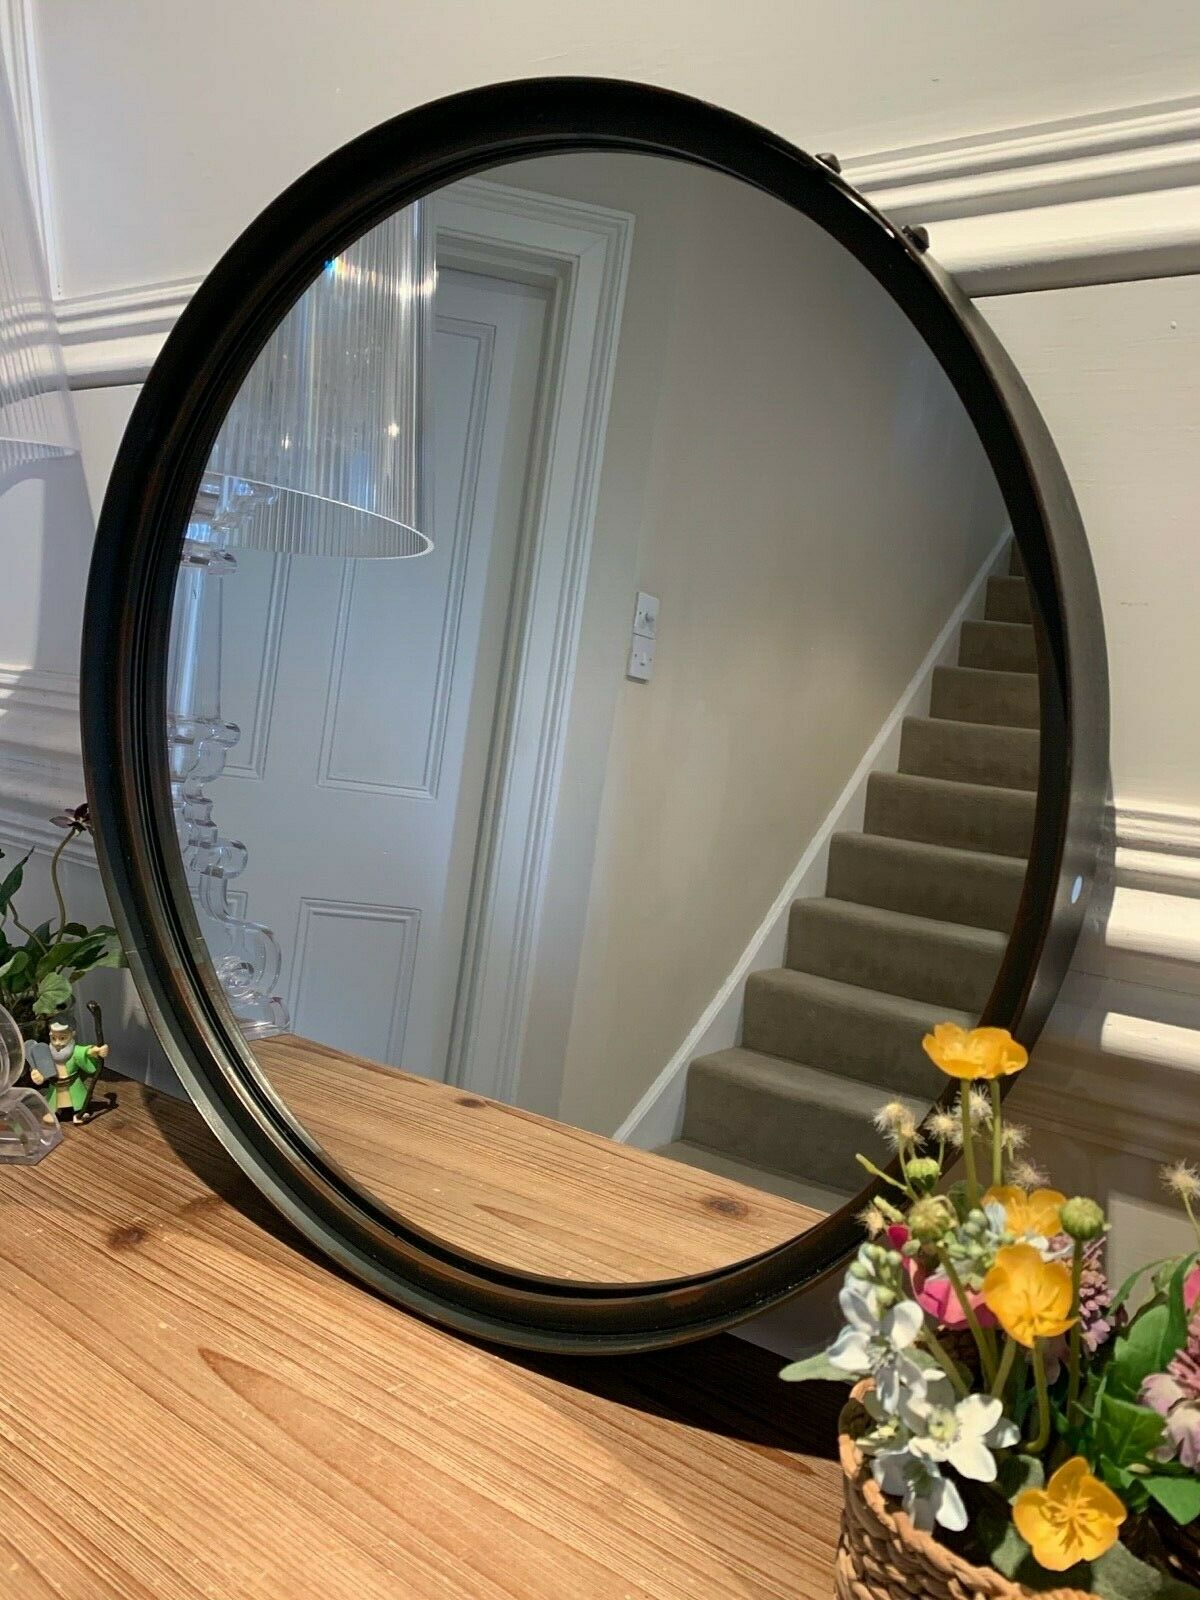 Aged Rust artisan round mirror 55cm diameter